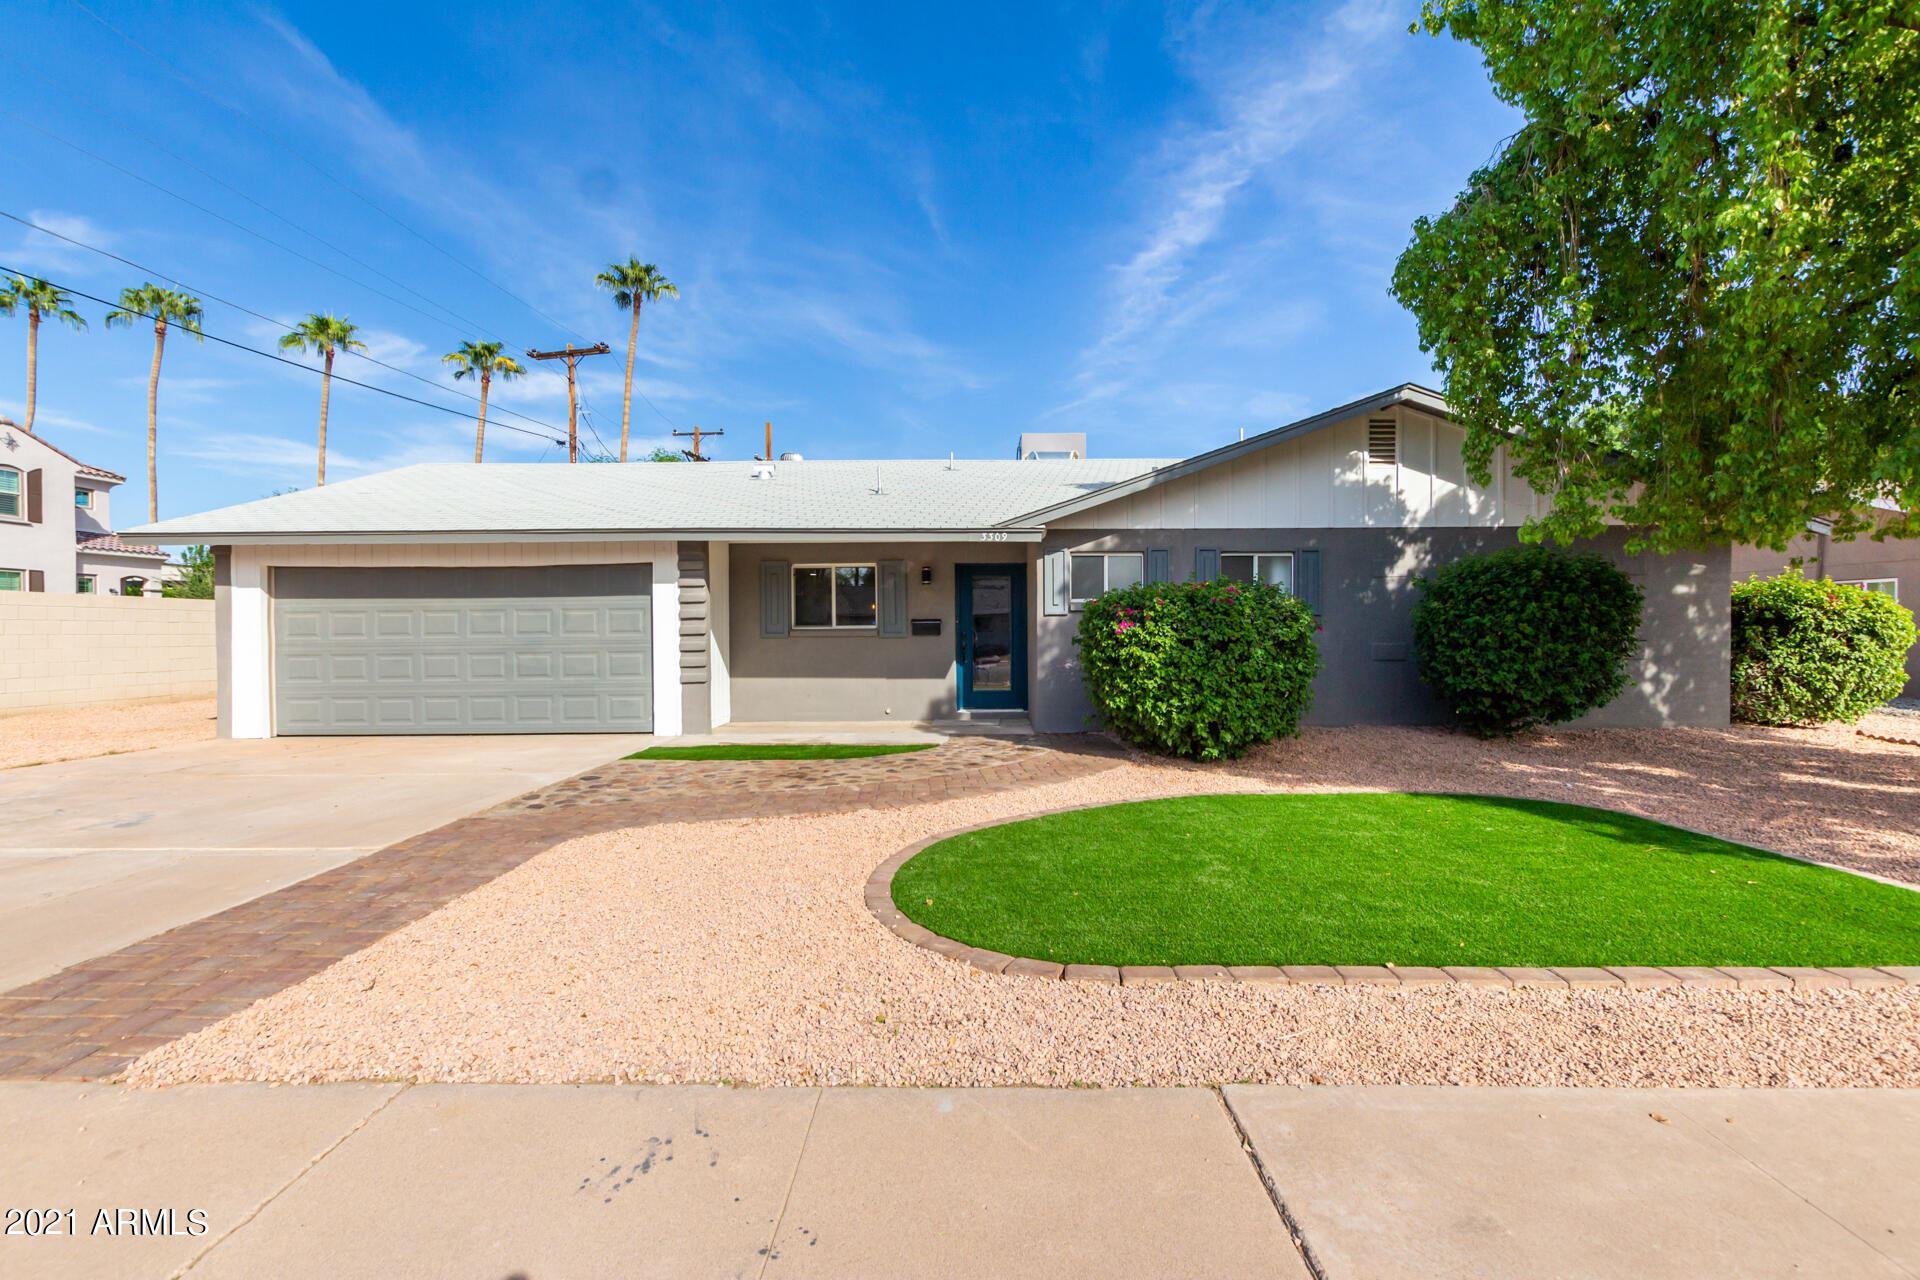 3309 N 25TH Place, Phoenix, AZ 85016 - MLS#: 6299495